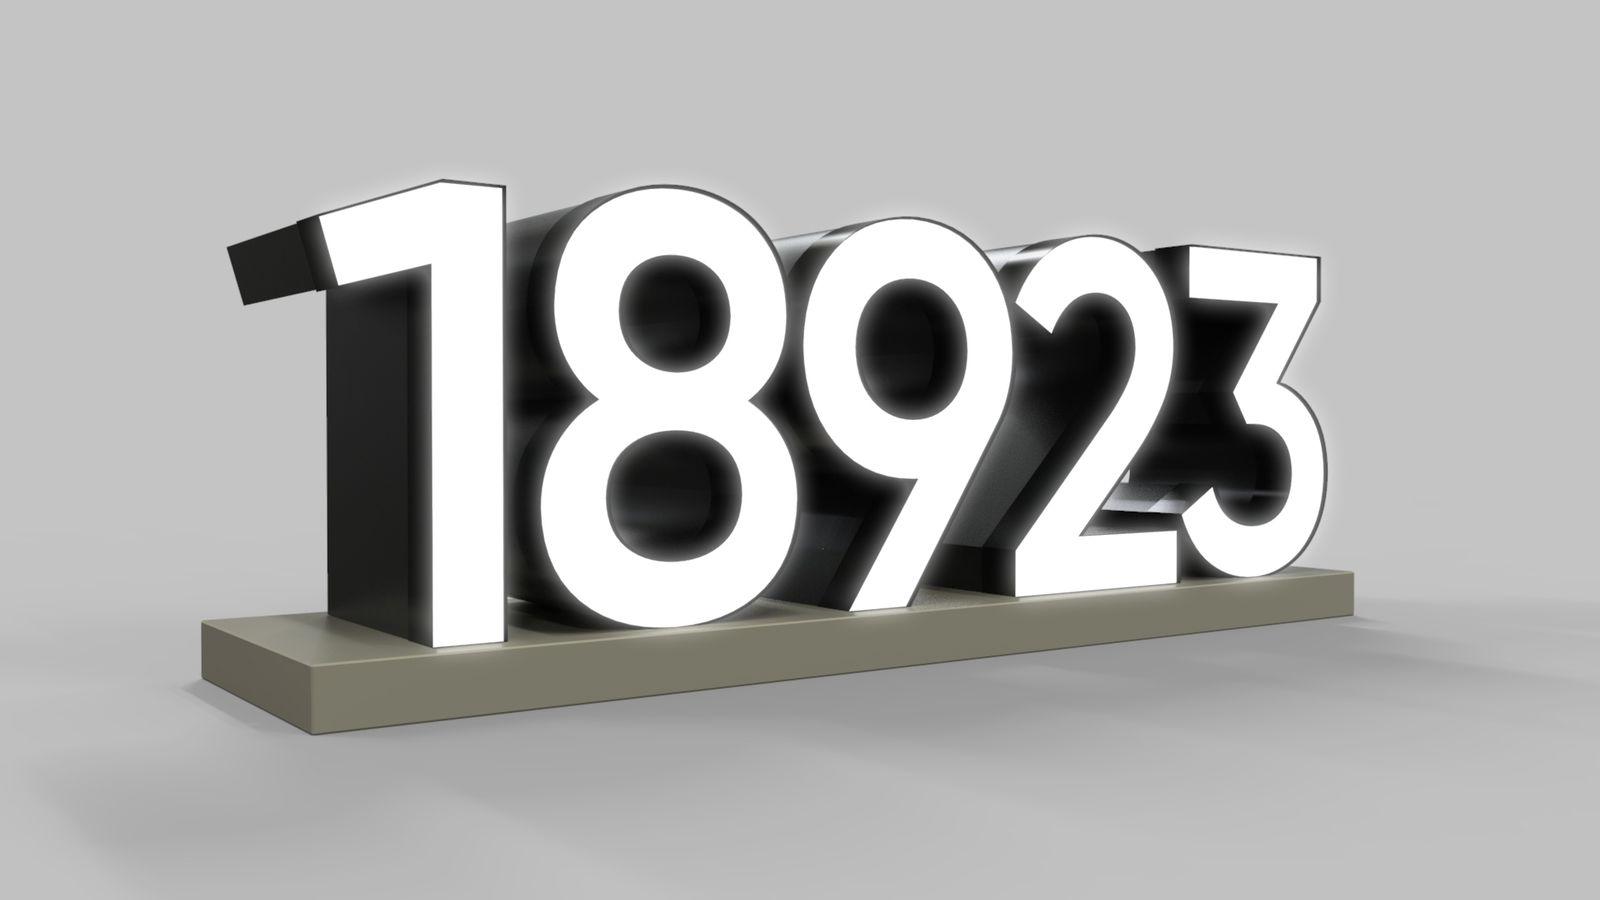 illuminated numbers 3d rendering